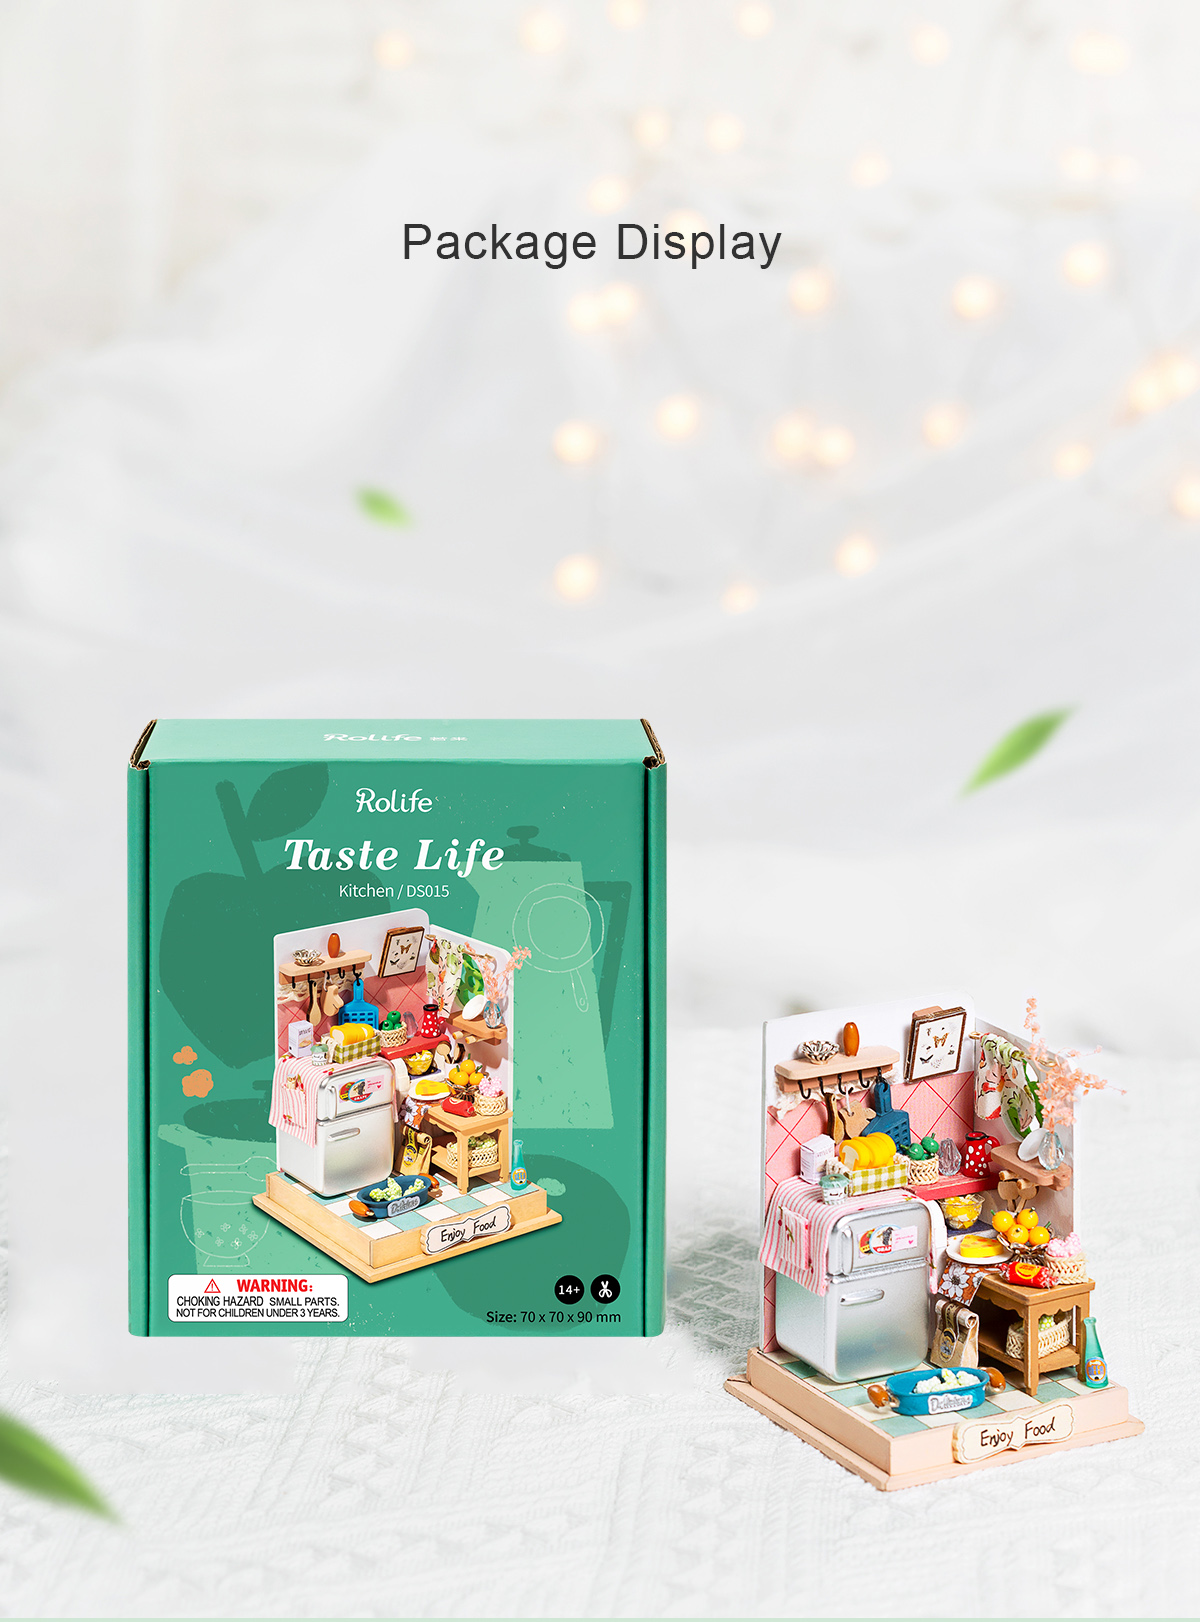 Rolife DIY Miniature Dollhouse - Taste Life(Kitchen) DS015